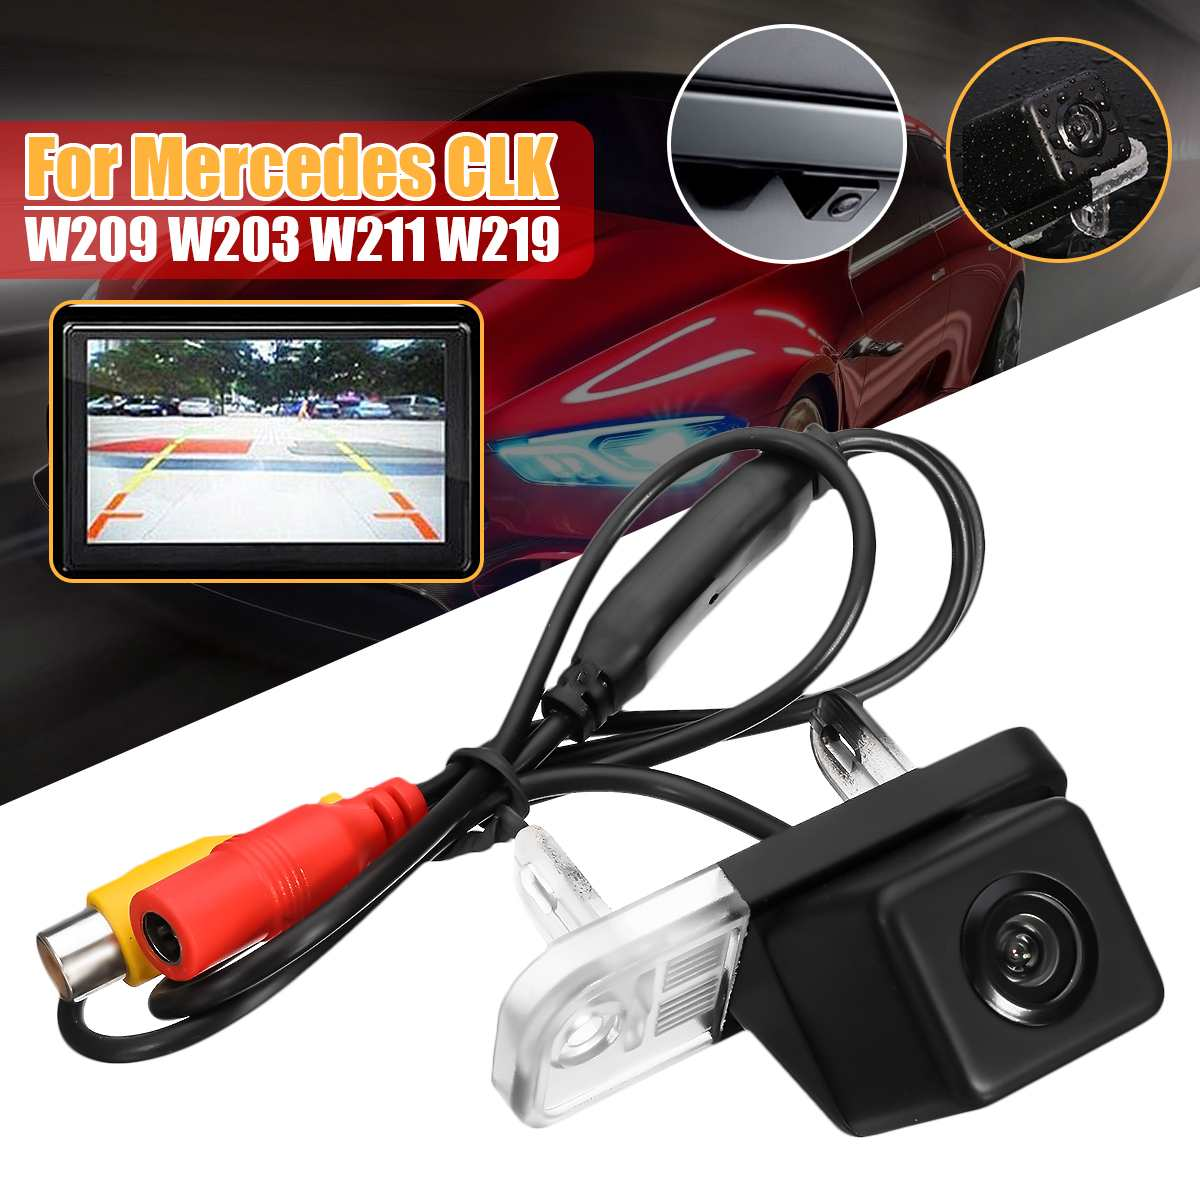 CCD HD Auto Car Rear View Camera Reverse Parking Night Vision Waterproof for Mercedes Benz CLK W209 W203 E Class W211 W219